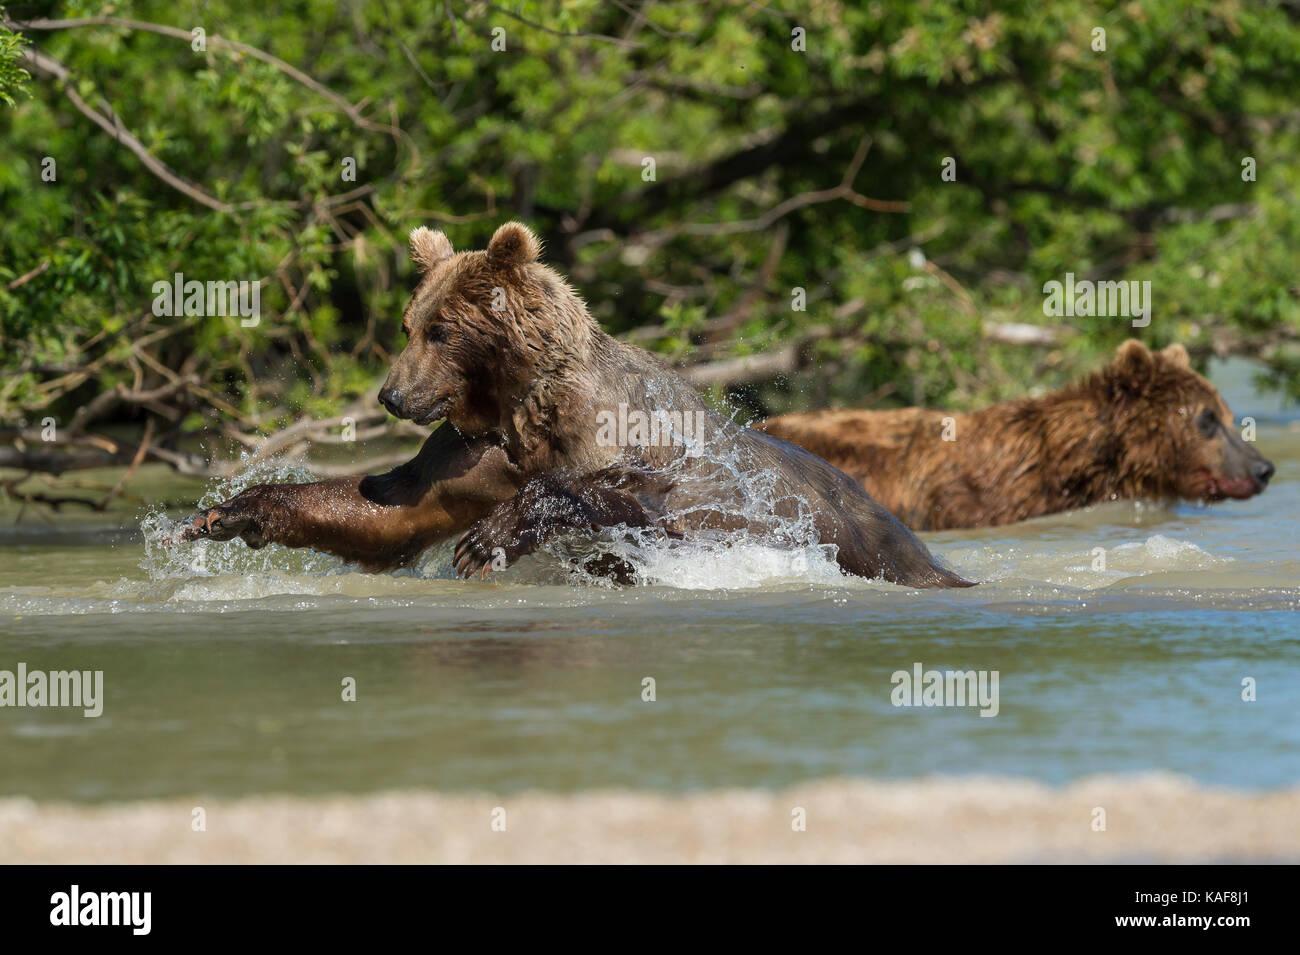 Brown bear pouncing on sockeye salmon, Kamchatka, Russia. Stock Photo